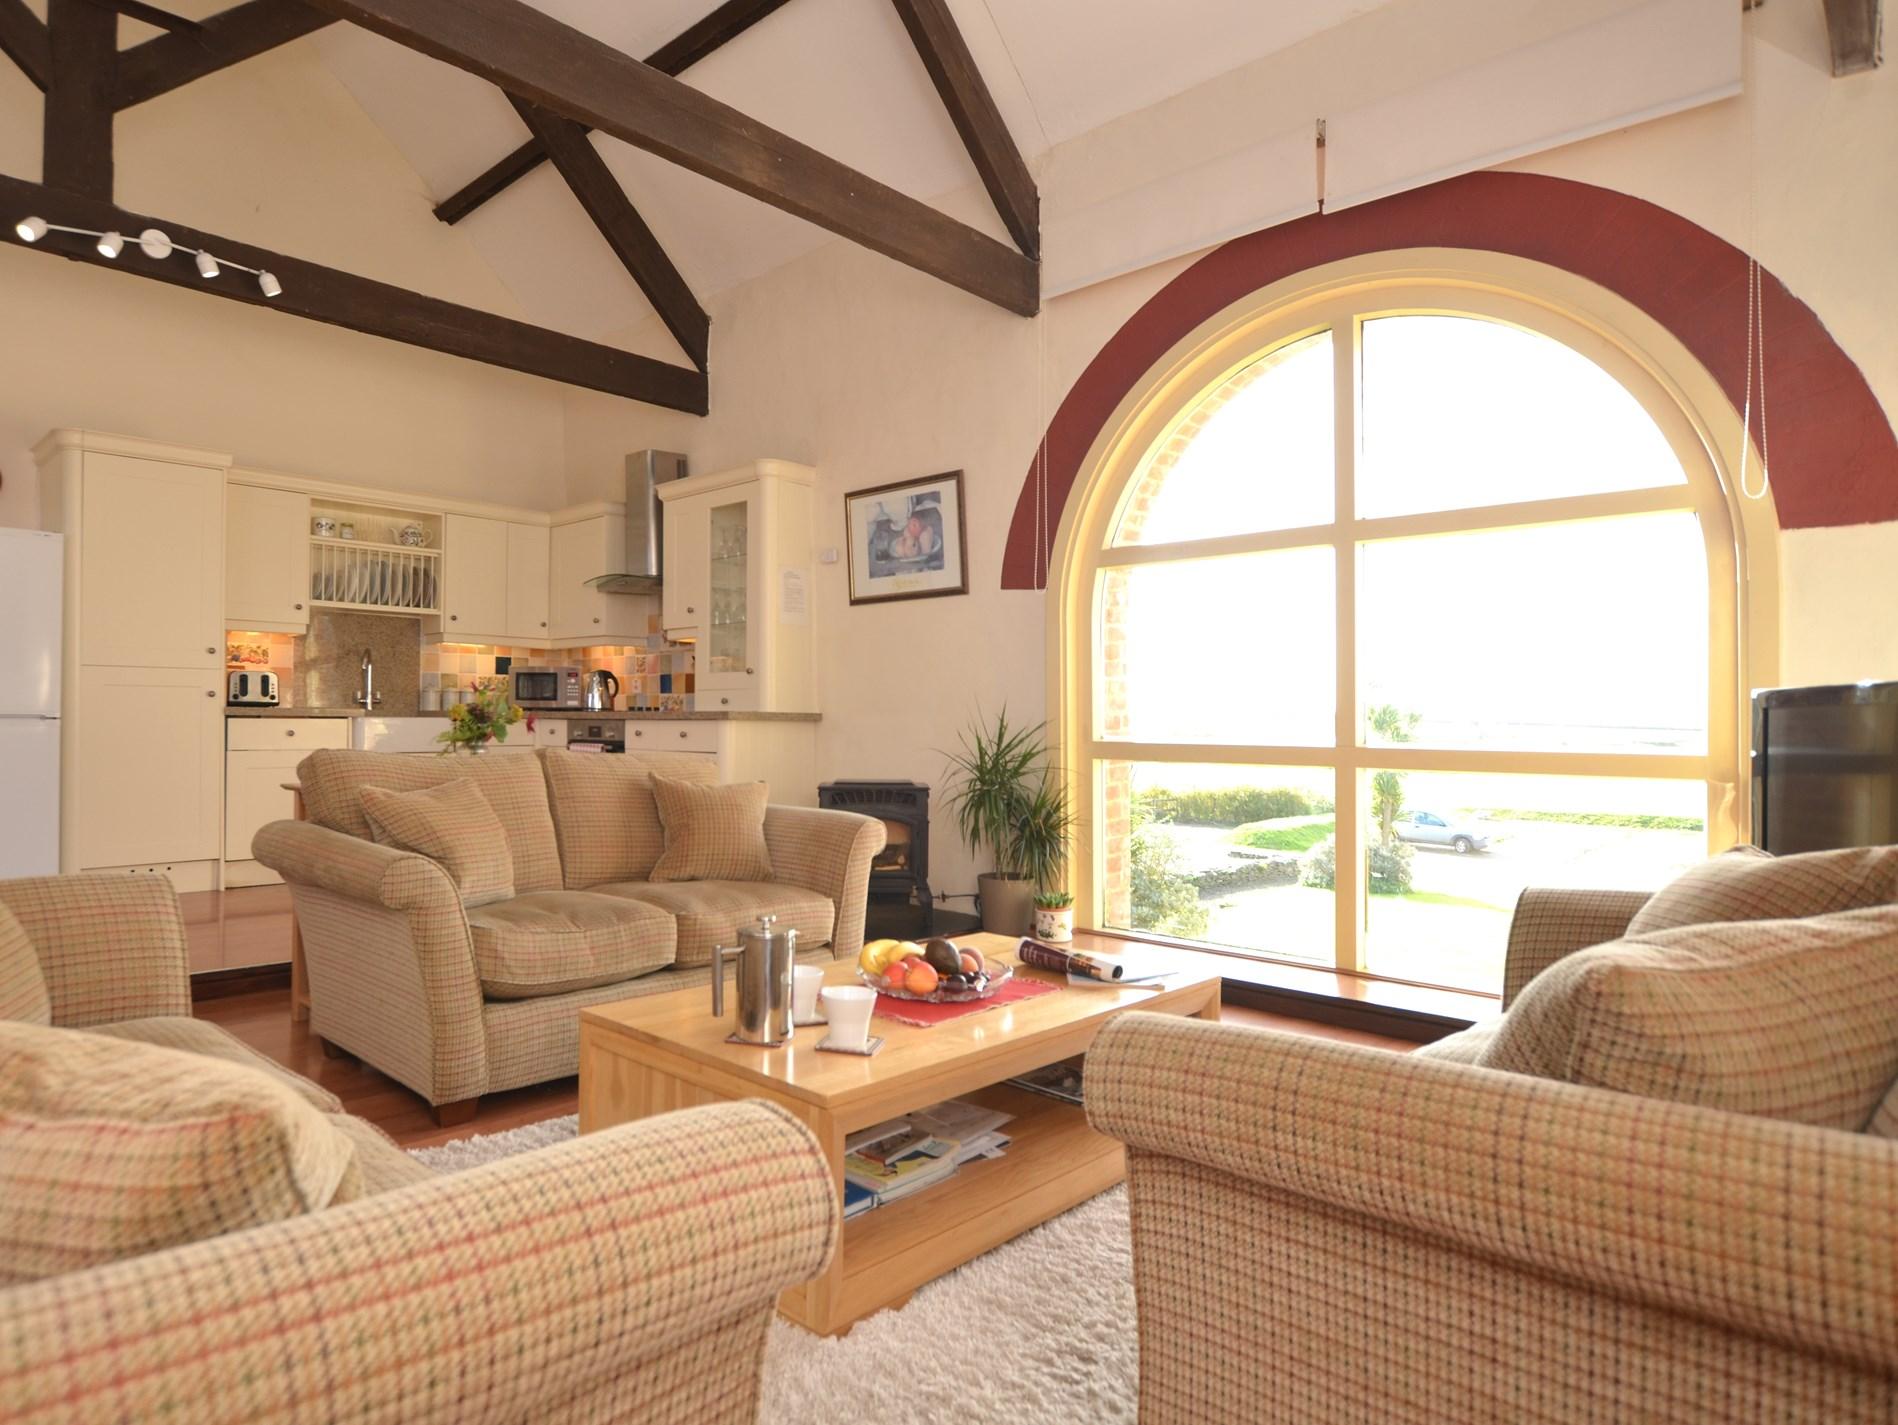 Beautiful open-plan living space